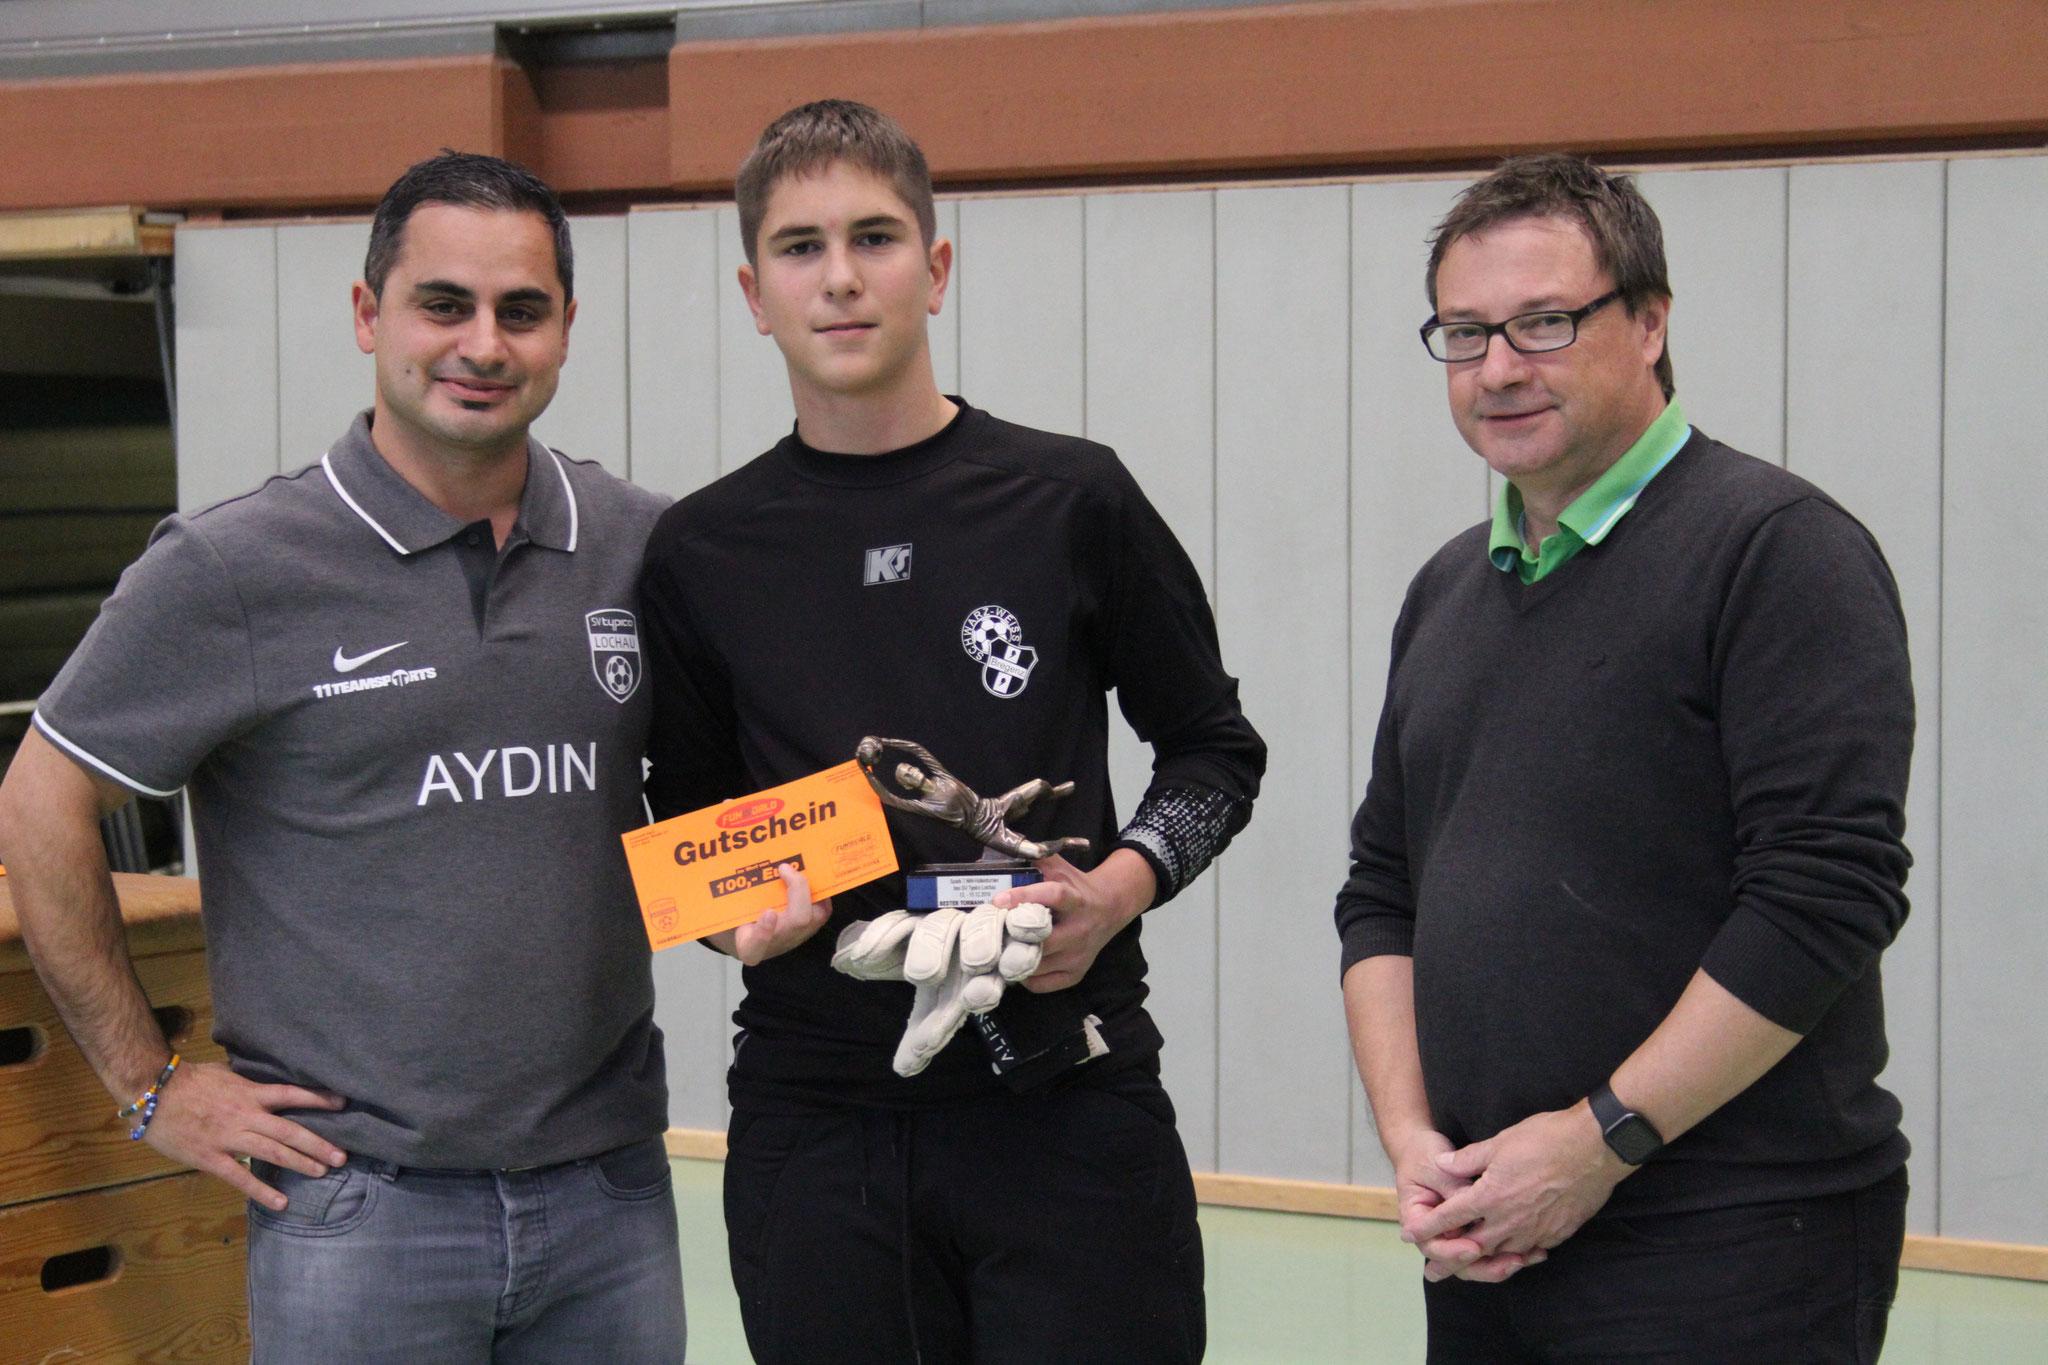 Bester Tormann U14 - Tyler-Ryan Linder (SW Bregenz)